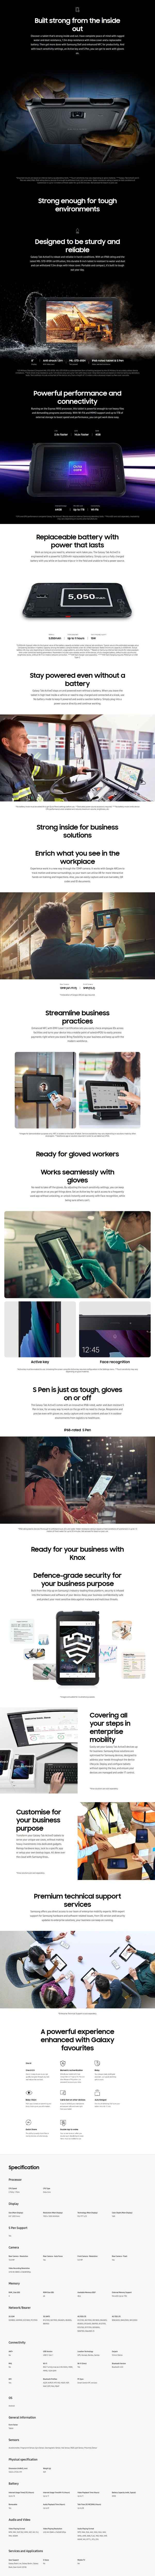 "Samsung Galaxy Tab Active 3 8"" 64GB 4G Wi-Fi - Black - Overview 1"